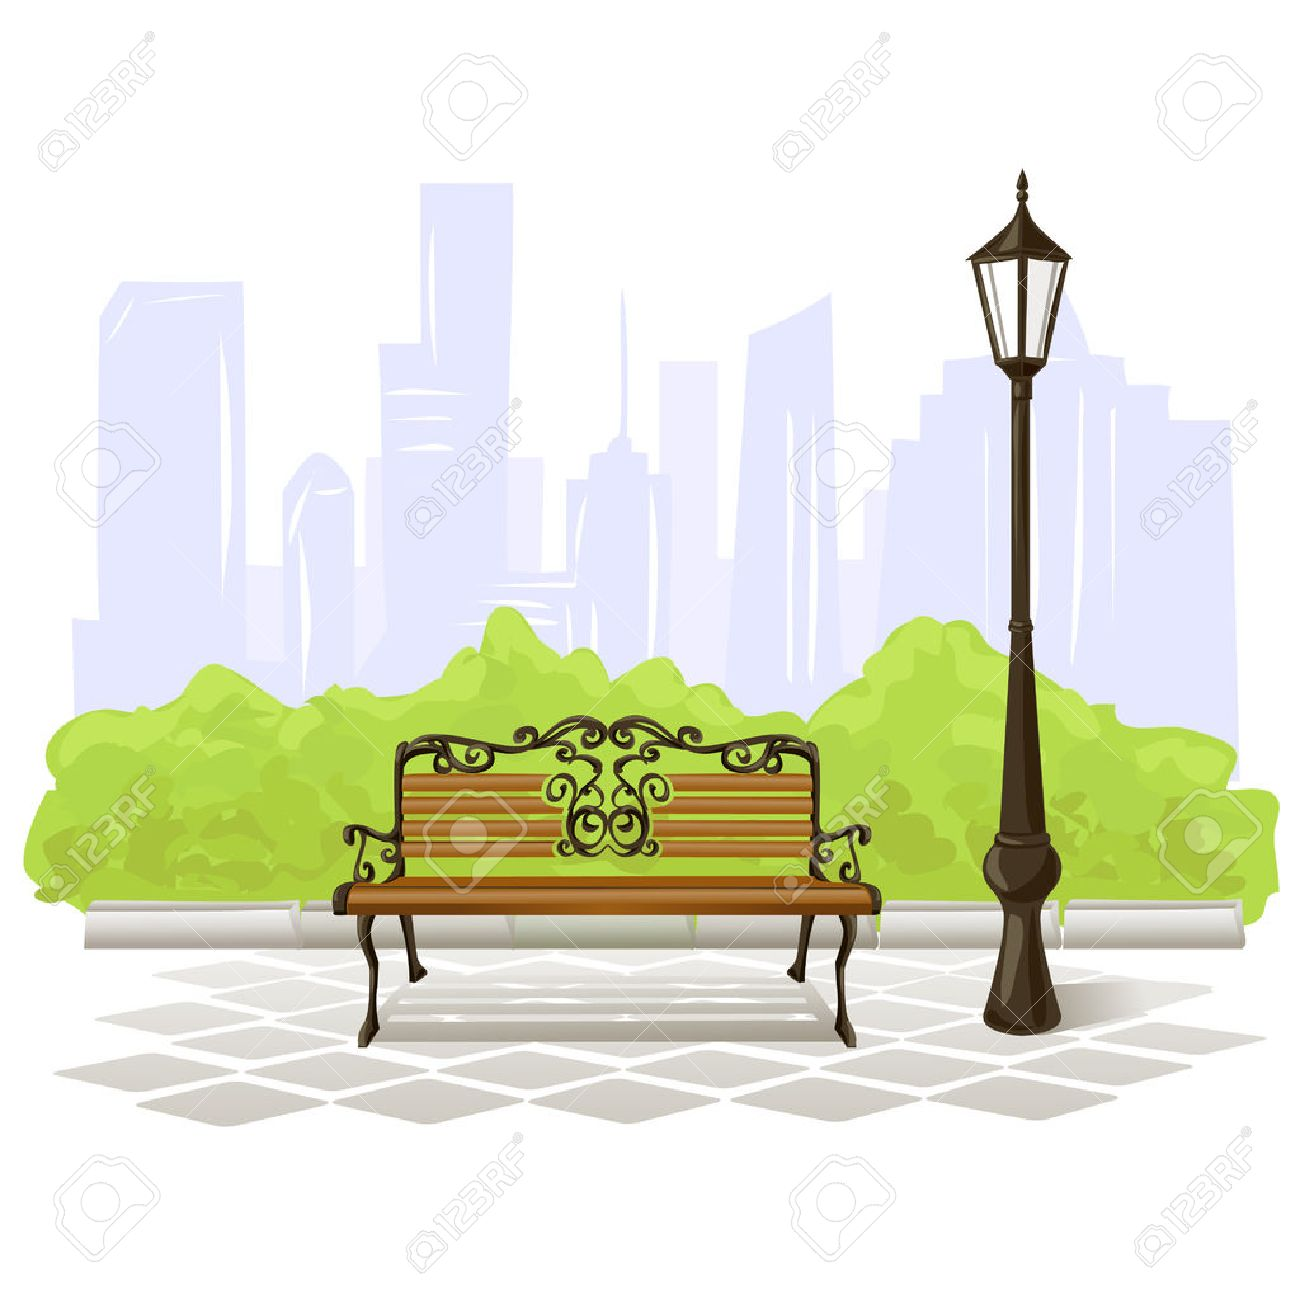 bench and streetlight on city background. vector illustration Standard-Bild - 26233727